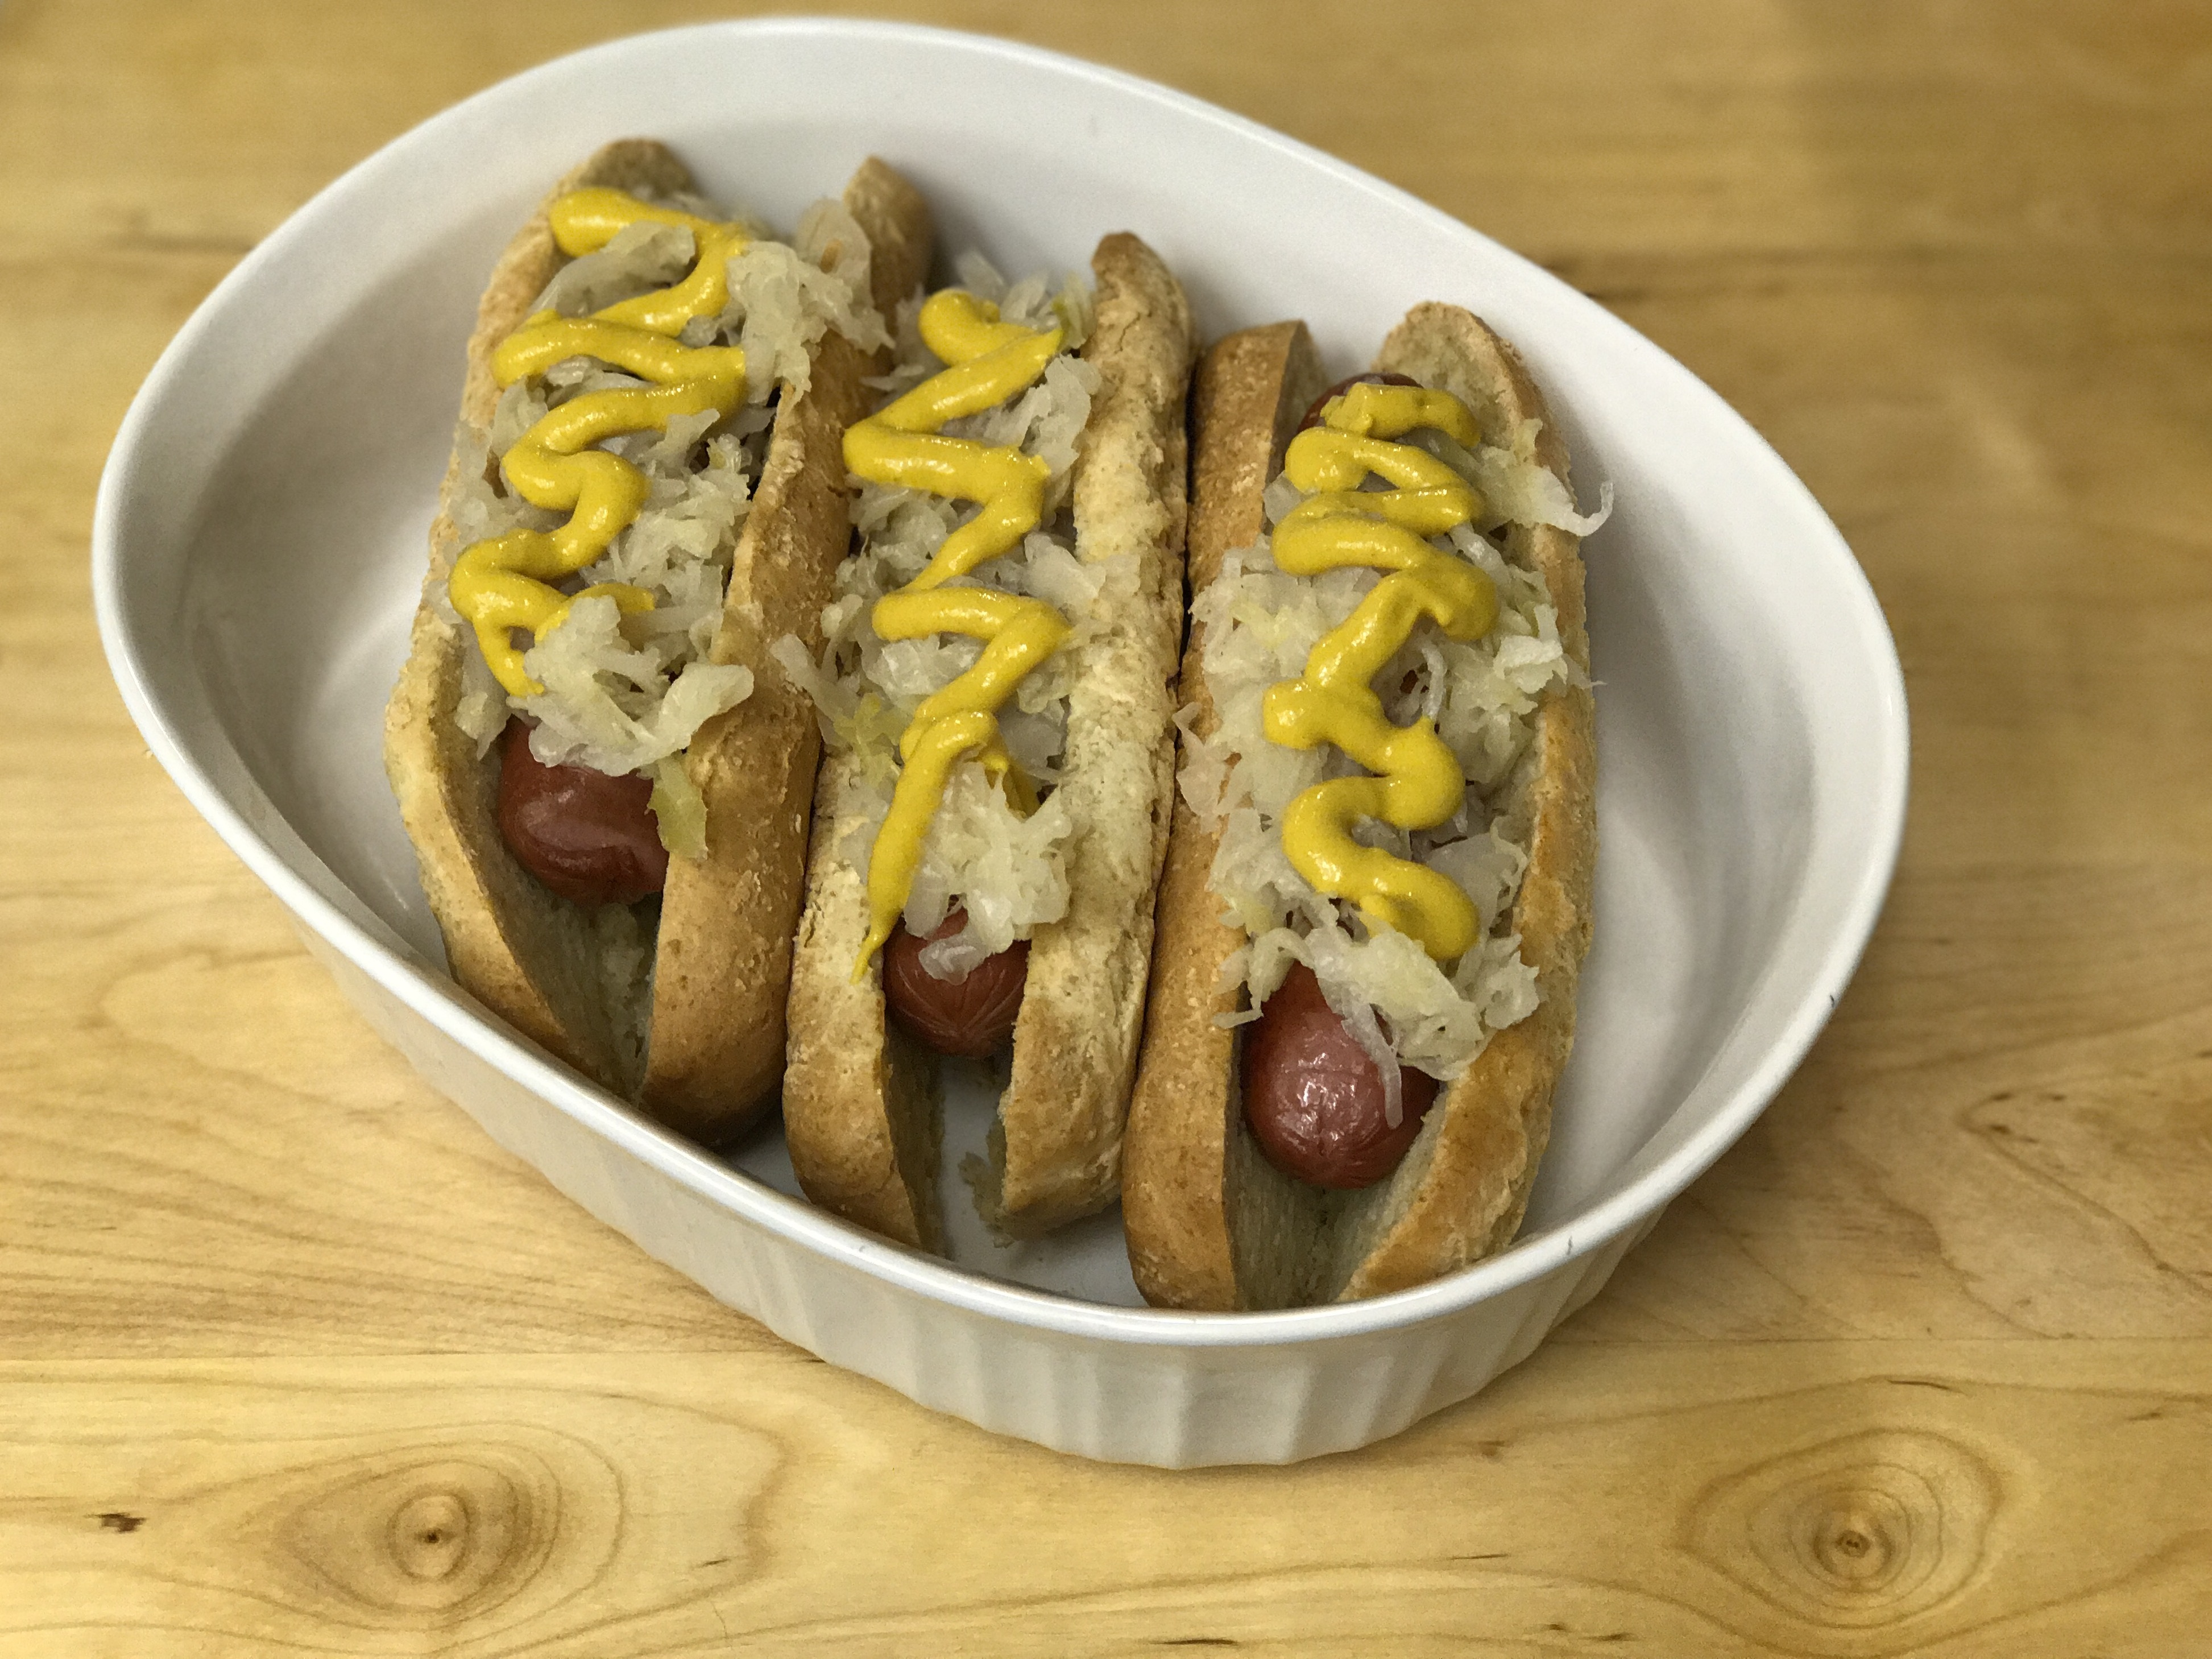 Paleo Hot Dog Buns